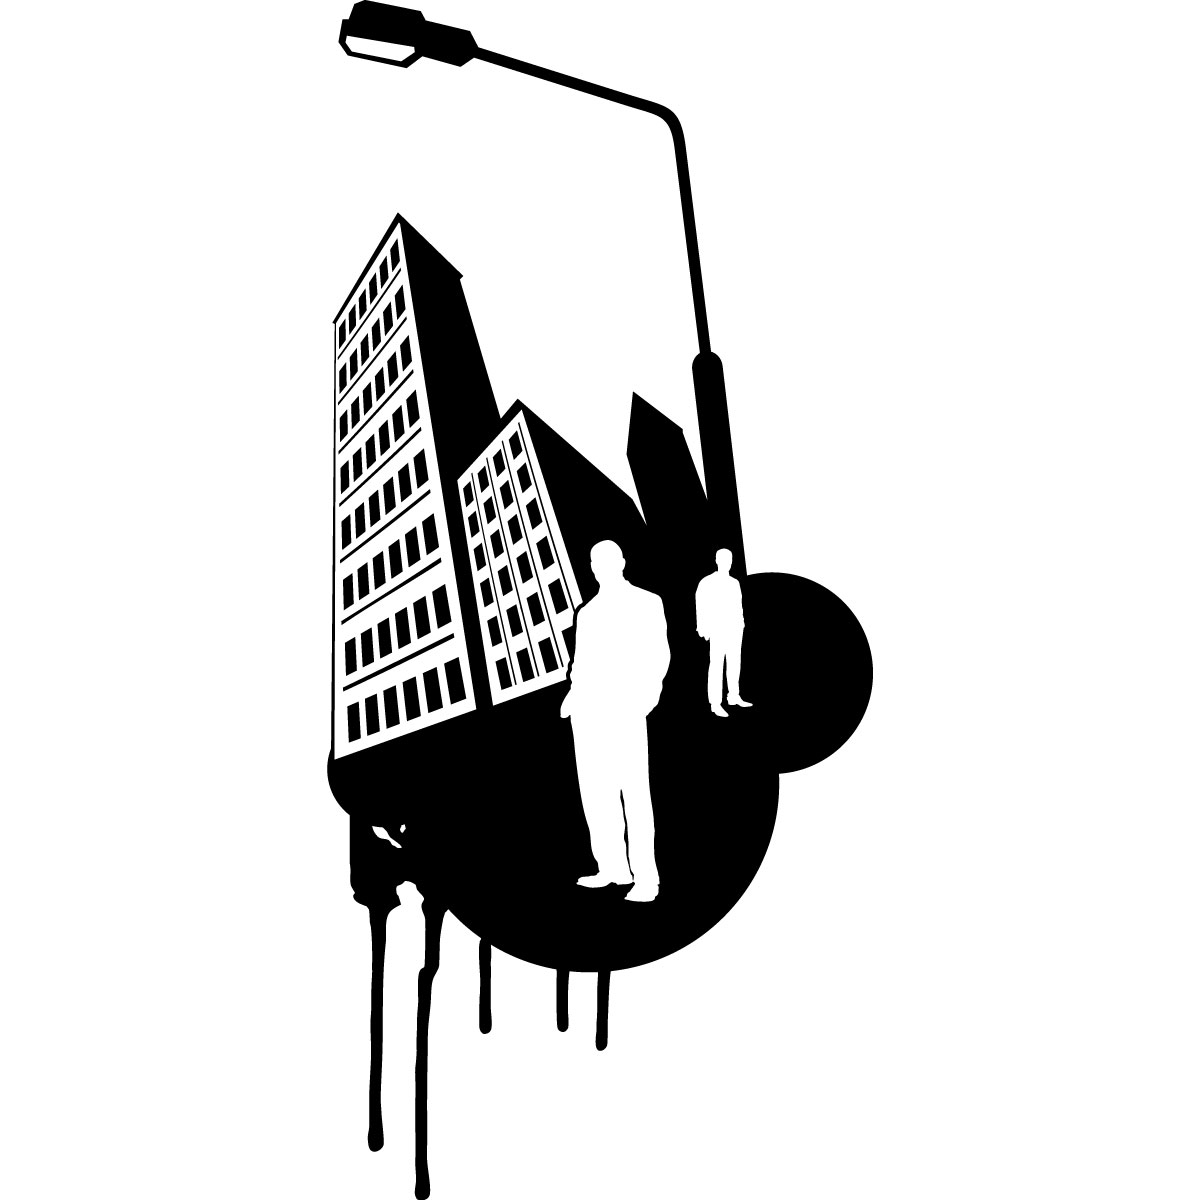 stickers muraux pays et villes sticker design urbain 2 ambiance. Black Bedroom Furniture Sets. Home Design Ideas